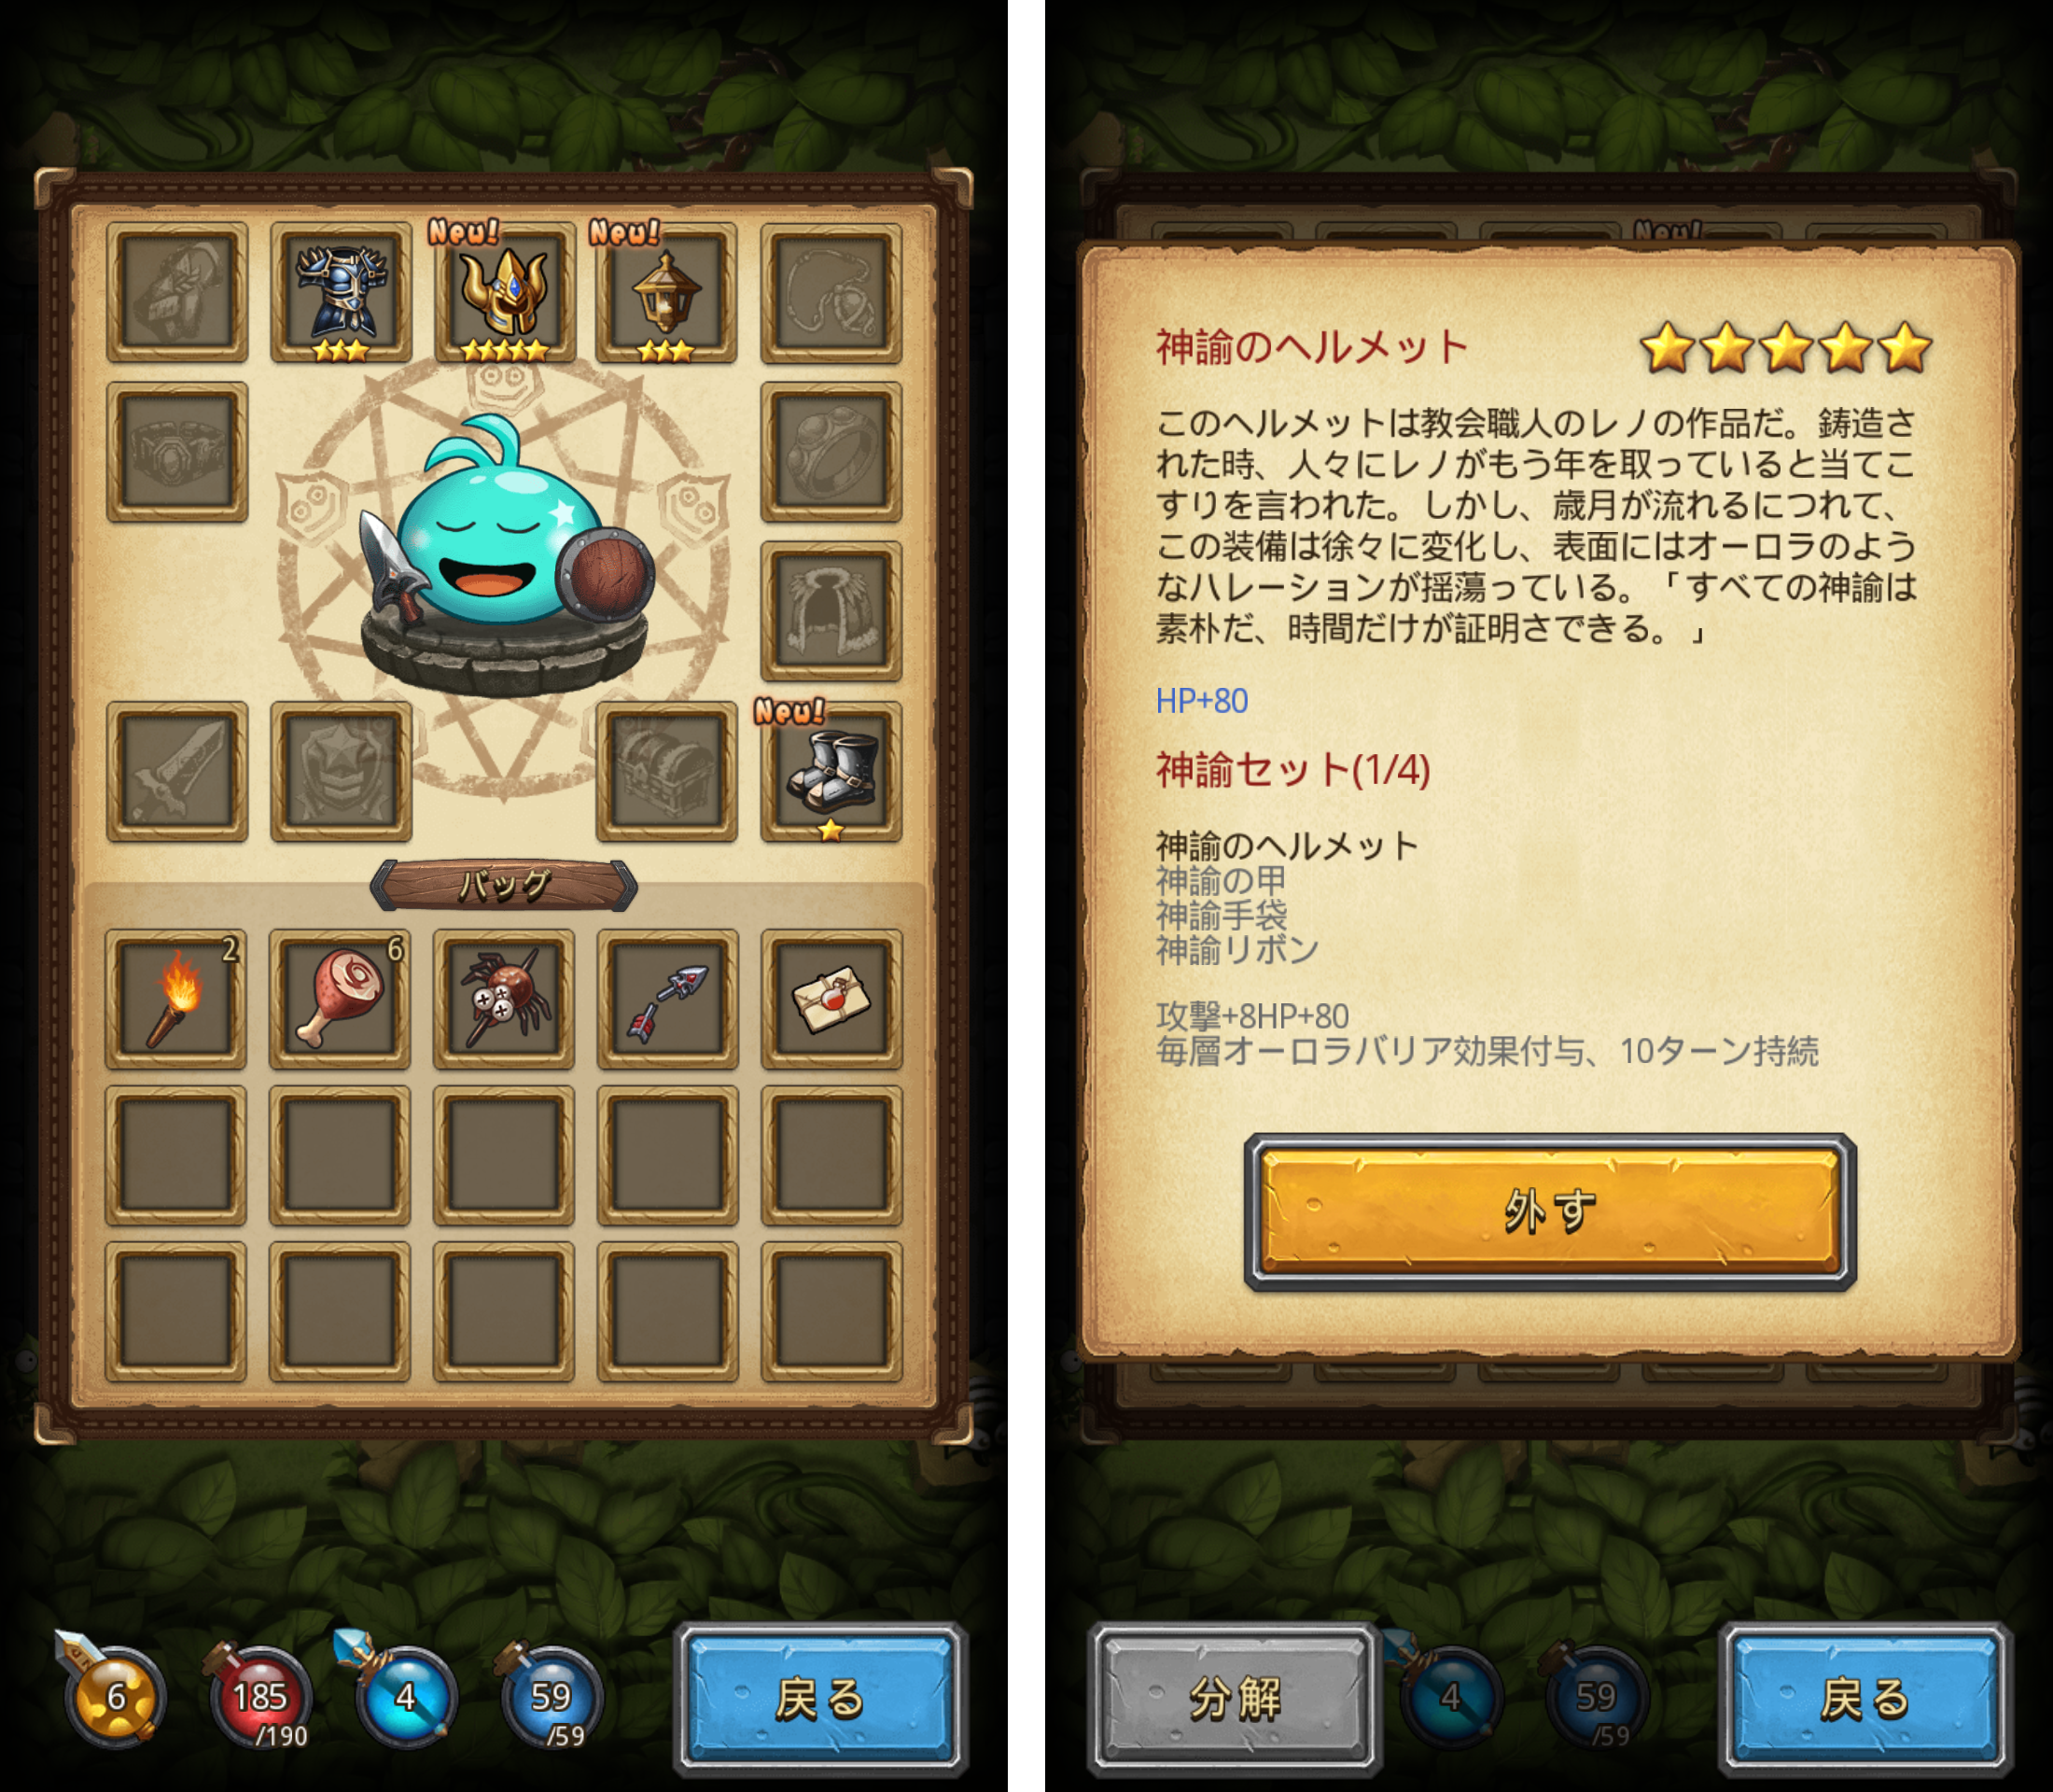 androidアプリ ダンジョンズ&ガンボル(Gumballs & Dungeons)攻略スクリーンショット6